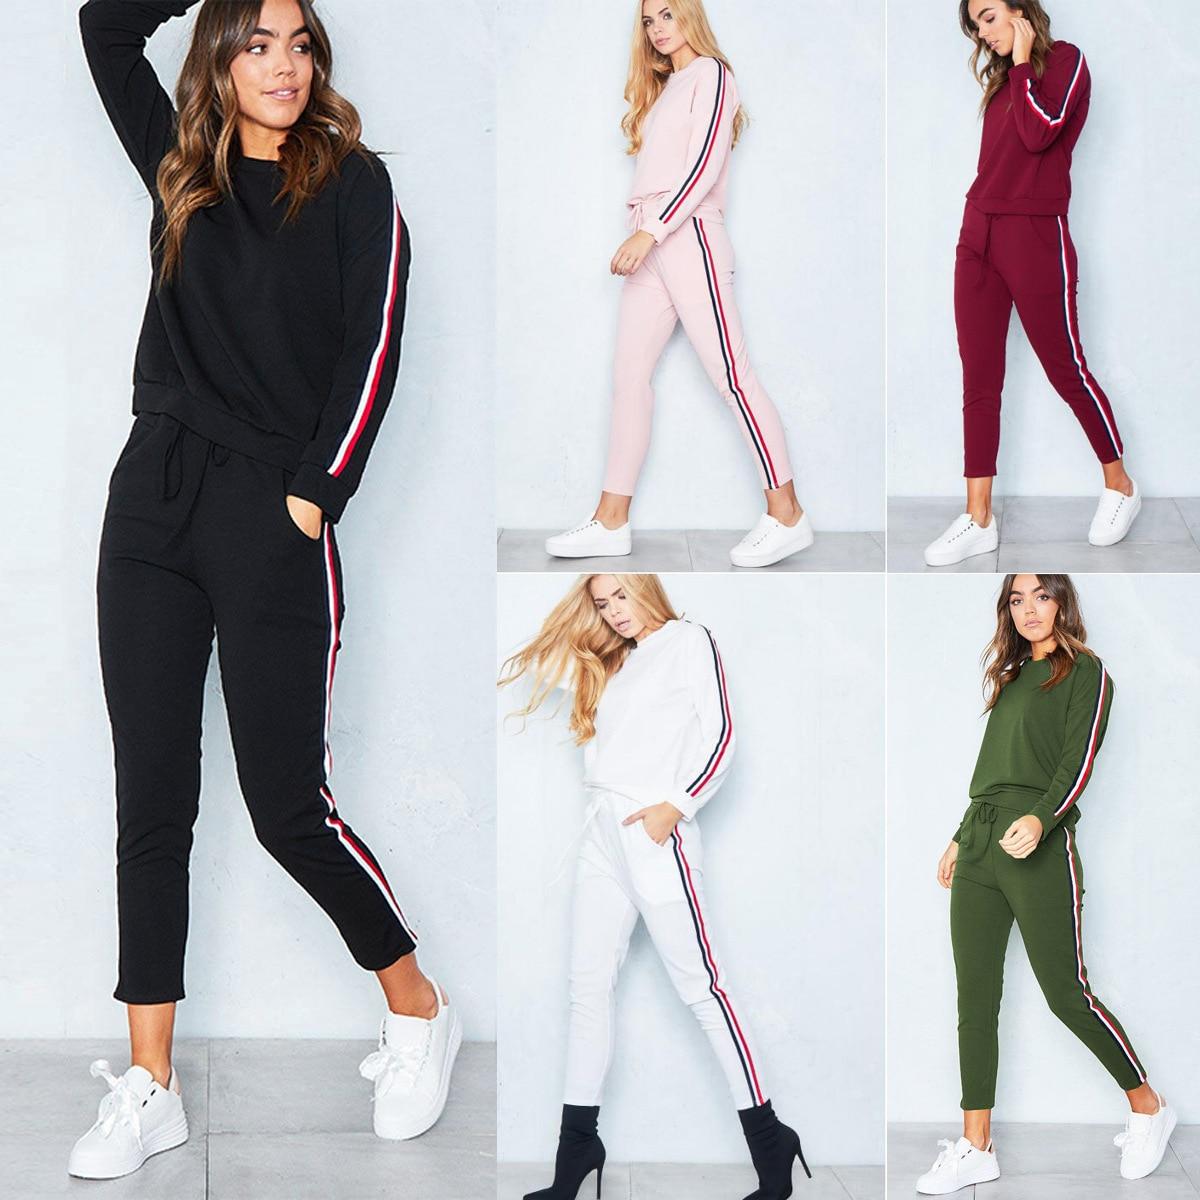 Striped Solid fashion Suit Set 2020 Women Tracksuit Two-piece Sport Style Outfit Jogging Sweatshirt Fitness Lounge Sportwear